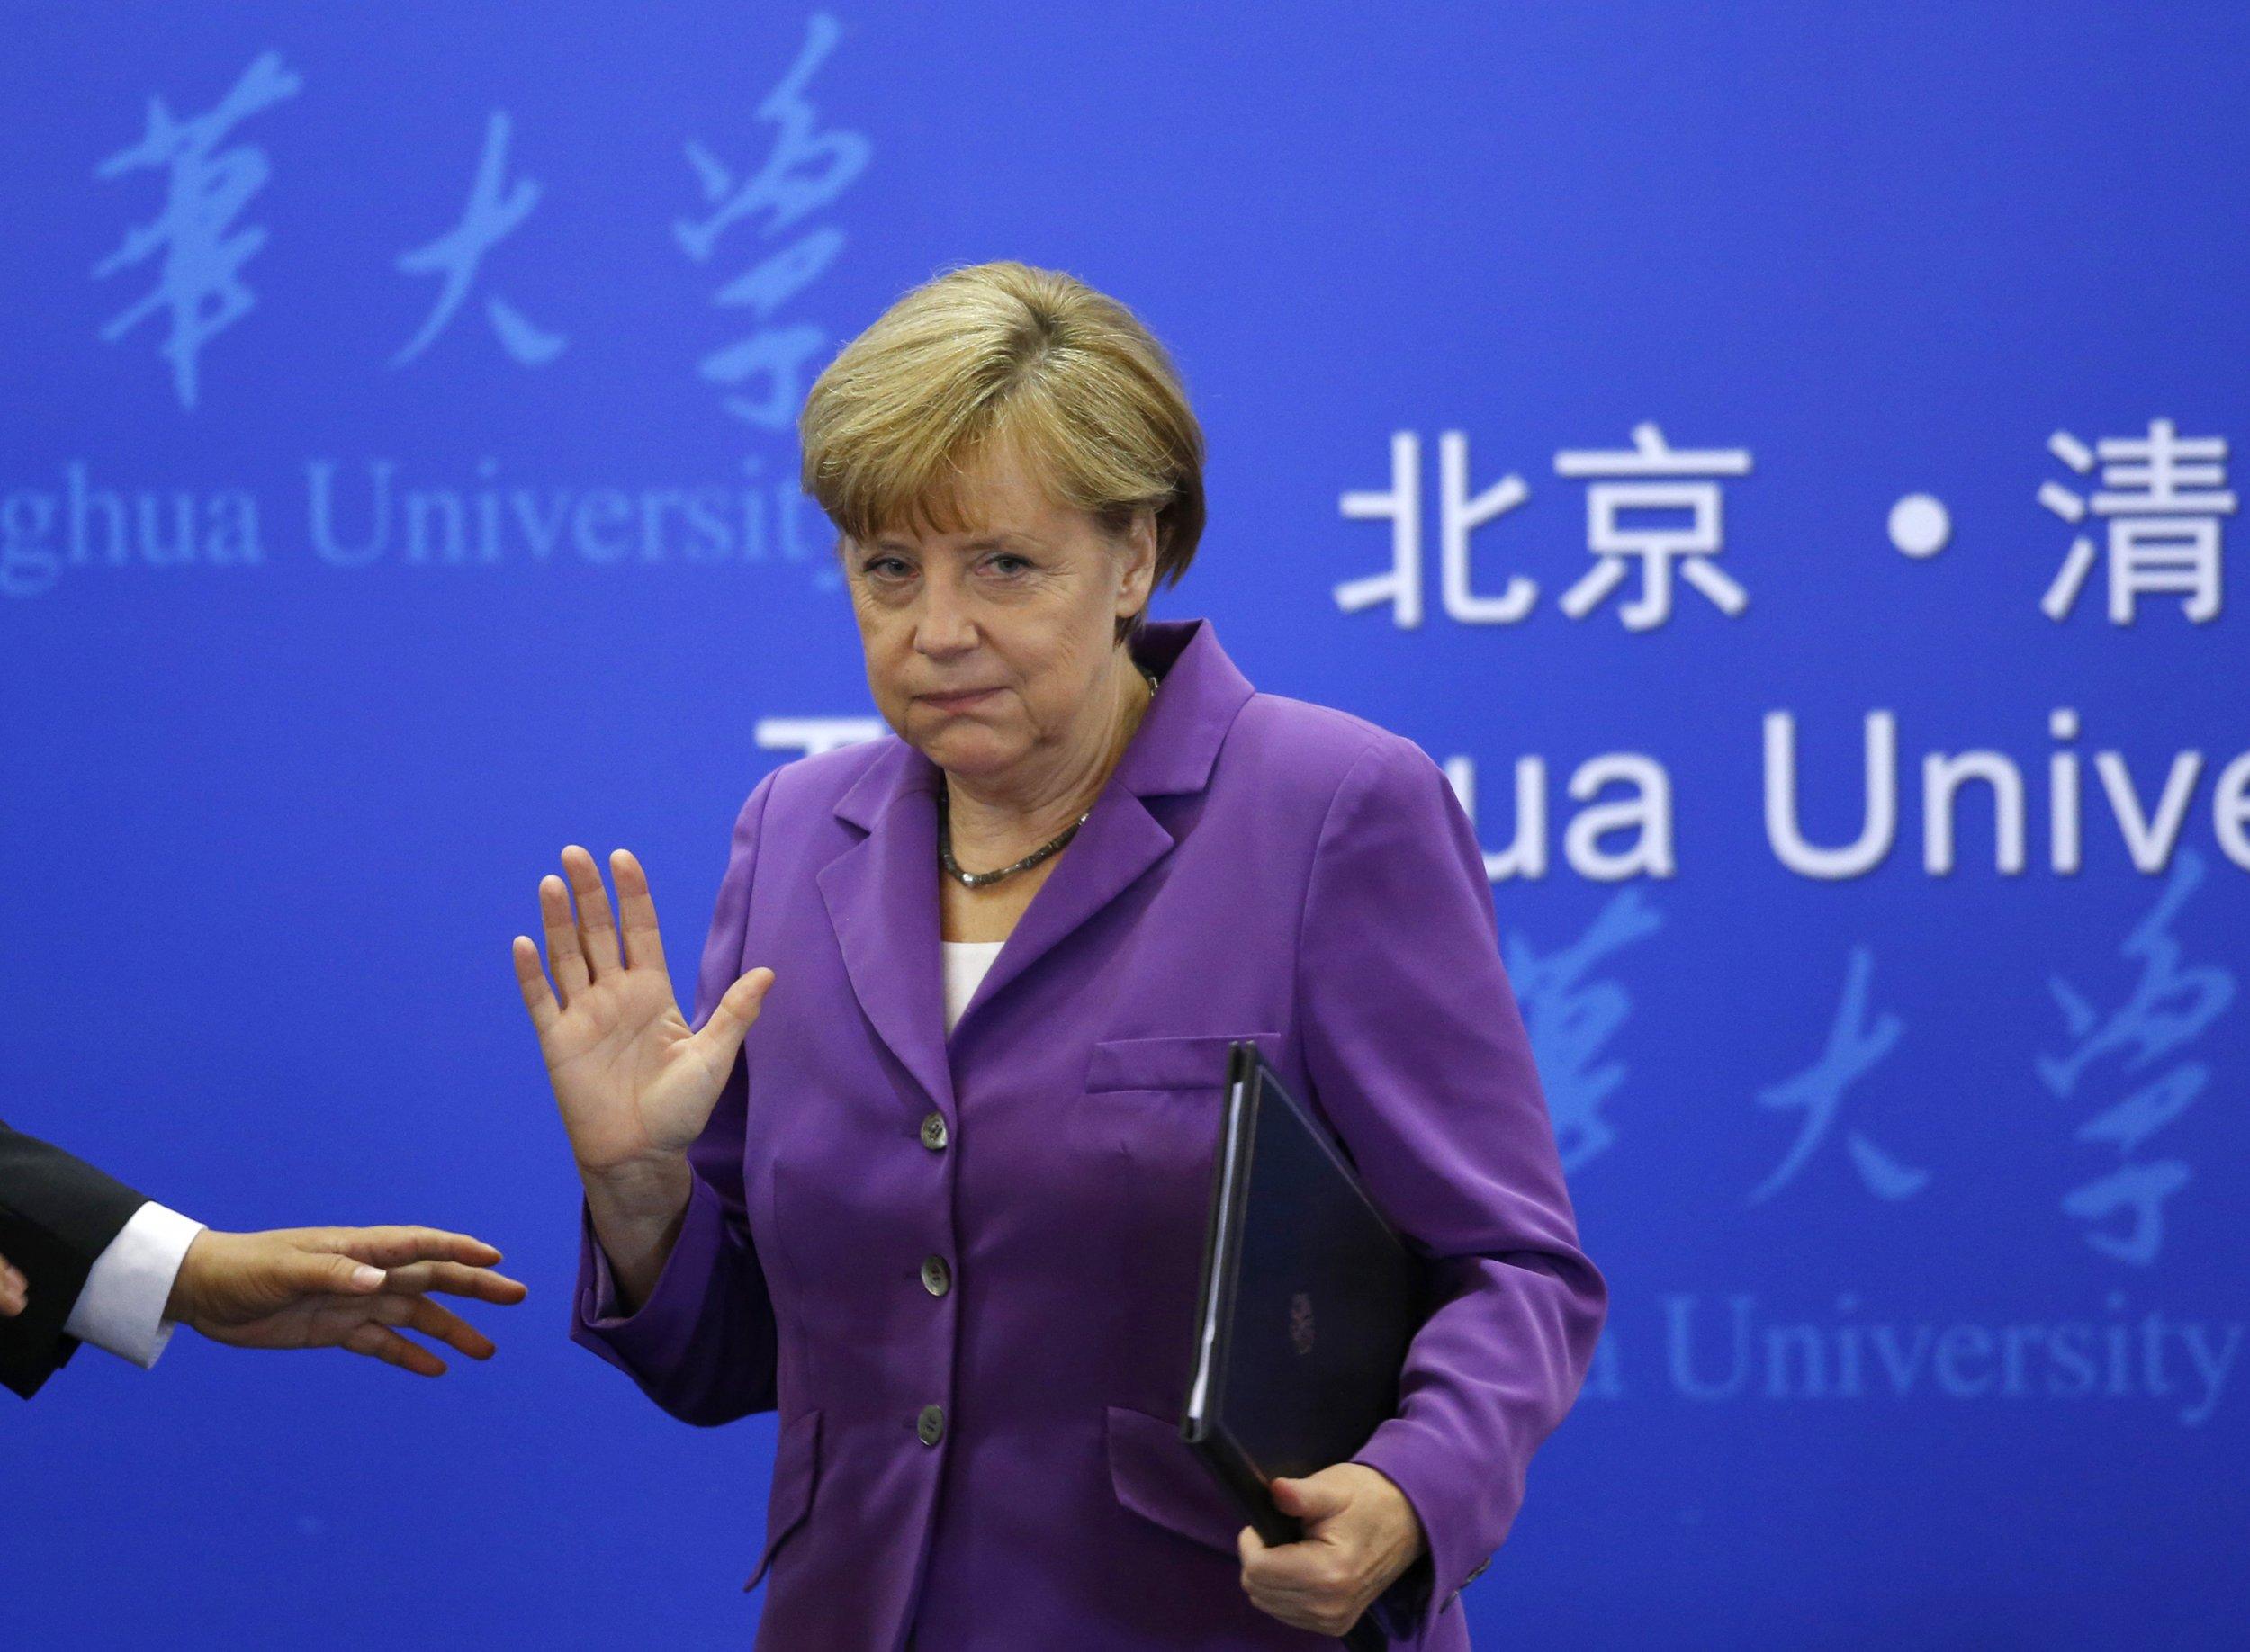 Angela Merkel in Beijing